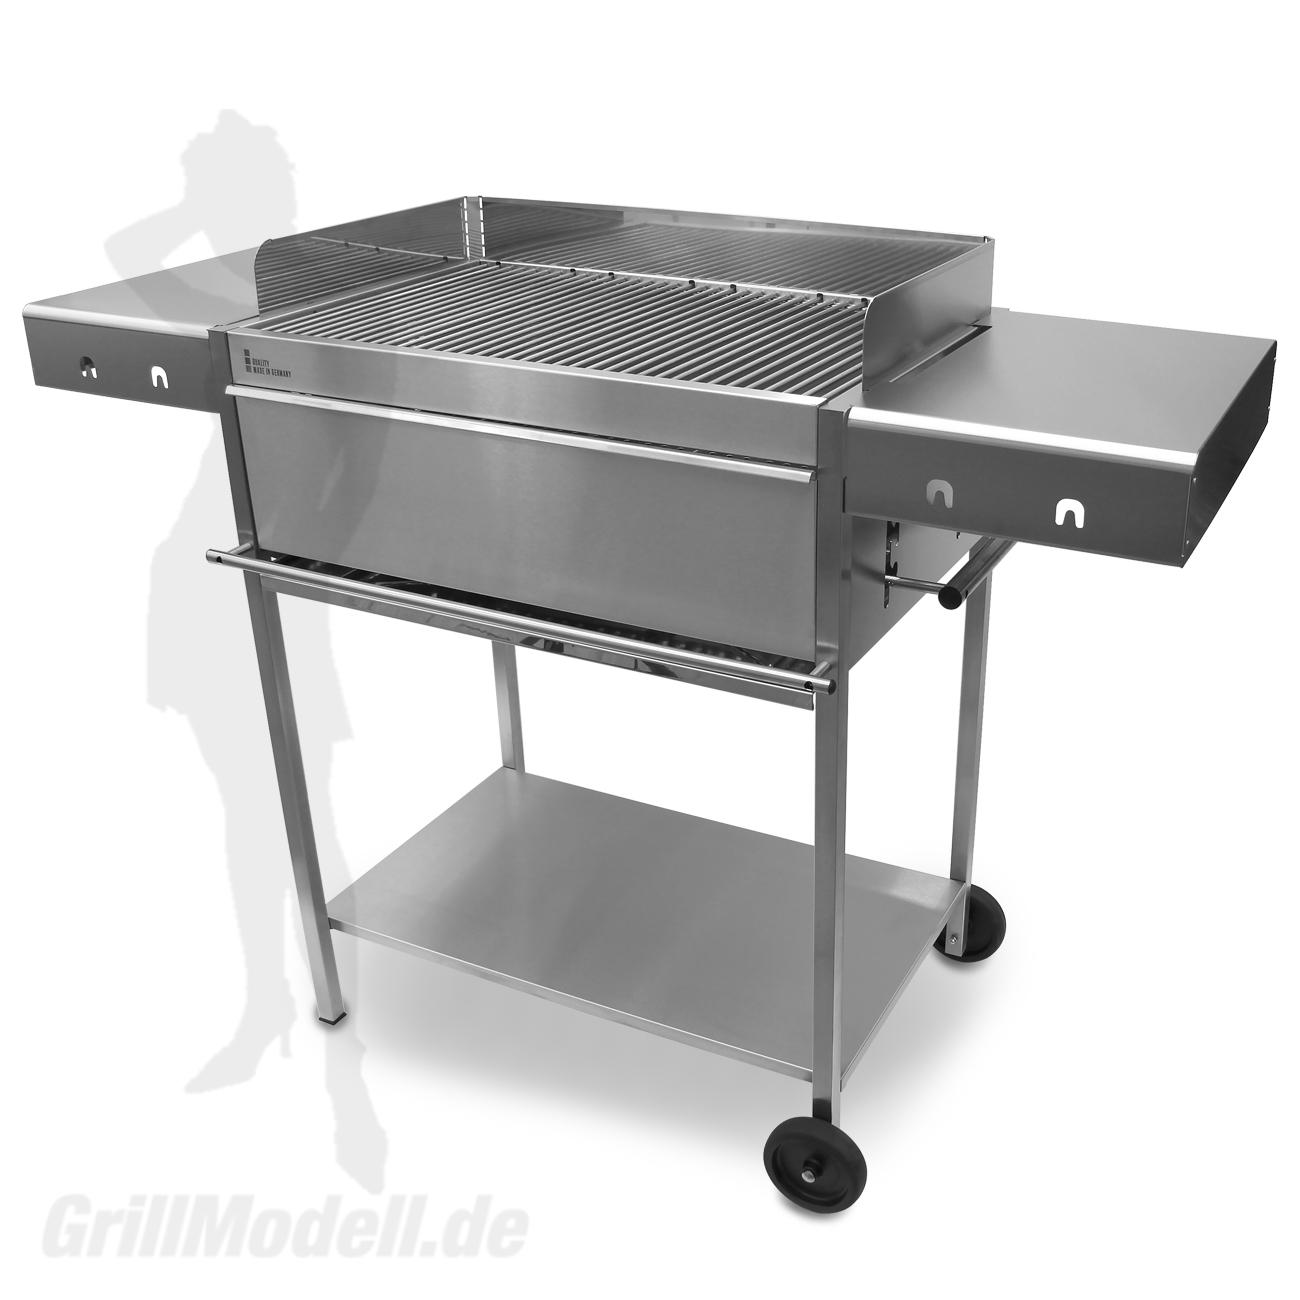 Holzkohlegrill Edelstahlgrill Edelstar XL Comfort komplett aus Edelstahl